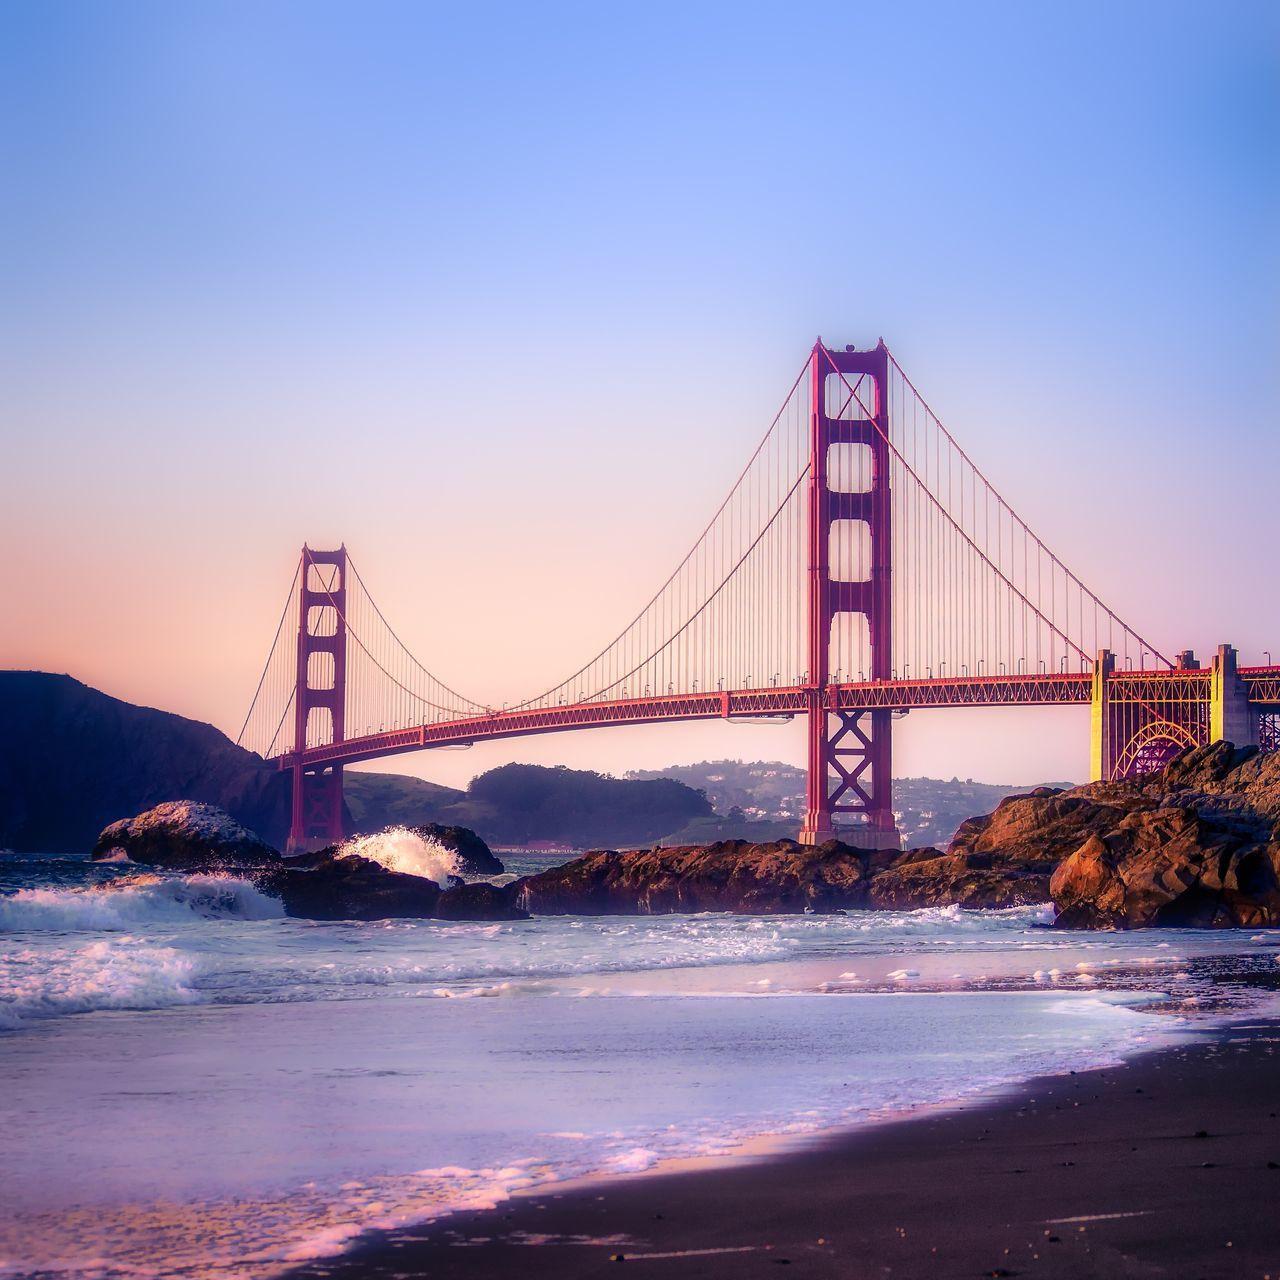 Bridge Sunset Water Bay Area Travel Photography Golden Hour San Francisco Golden Gate Bridge Serenity... Travel Destinations Outdoors Architecture Travel San Francisco California Suspension Bridge Ocean Travel California Pacific Ocean Pacific Coast Beach